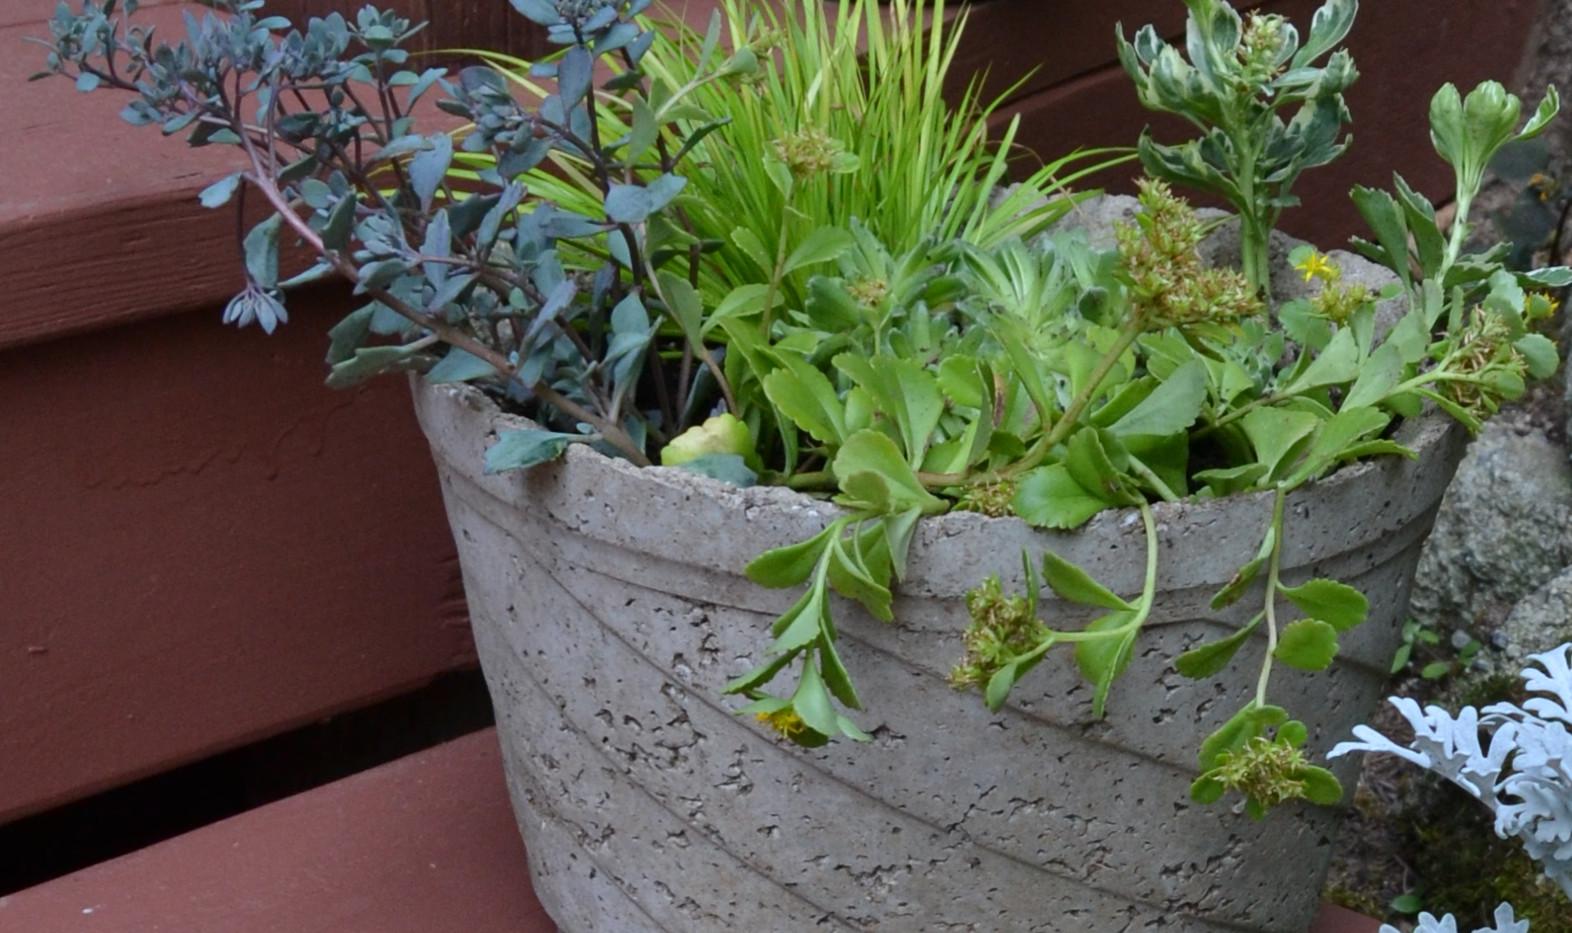 Succulent garden in handmade hypertufa pot. Prices range from $15 to $25